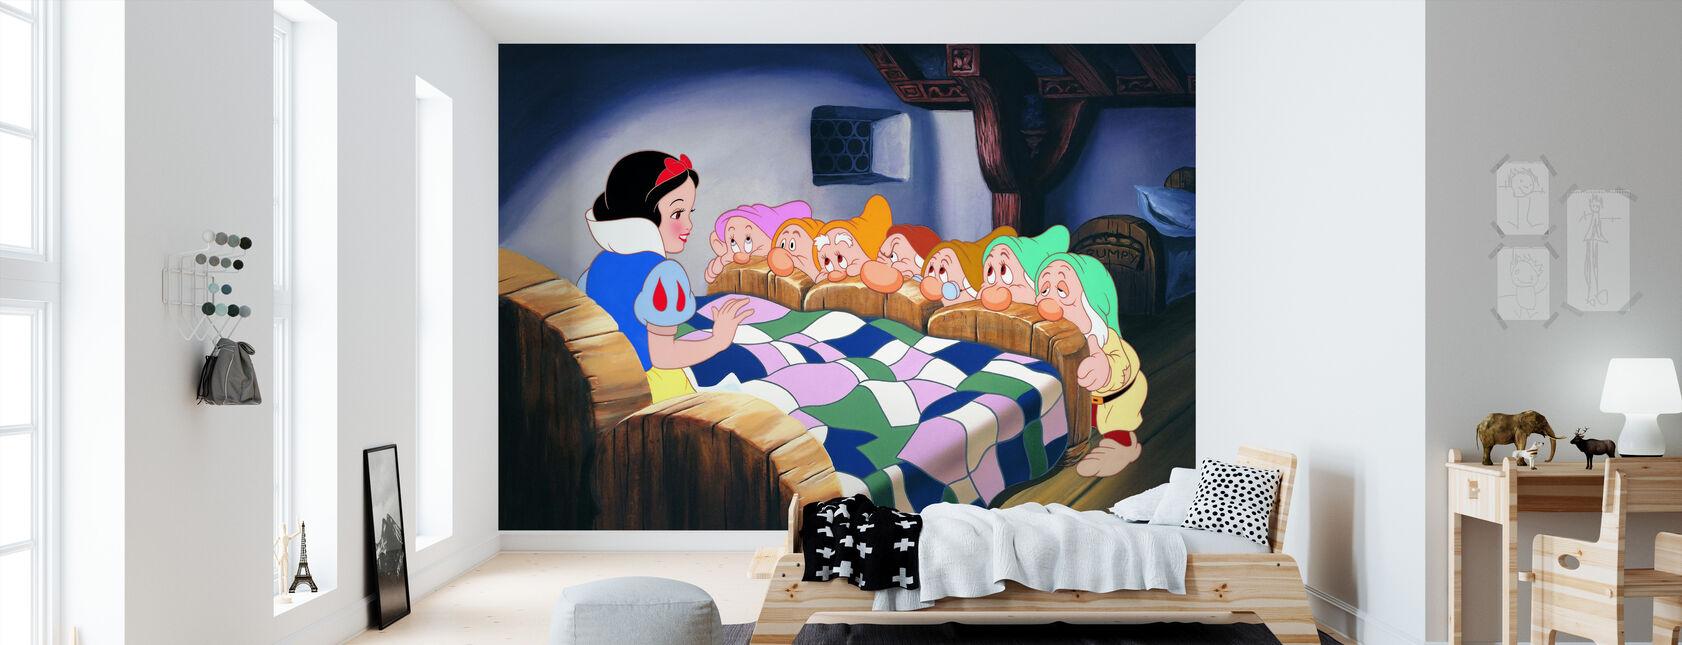 Snow White and the Seven Dwarfs - Wallpaper - Kids Room